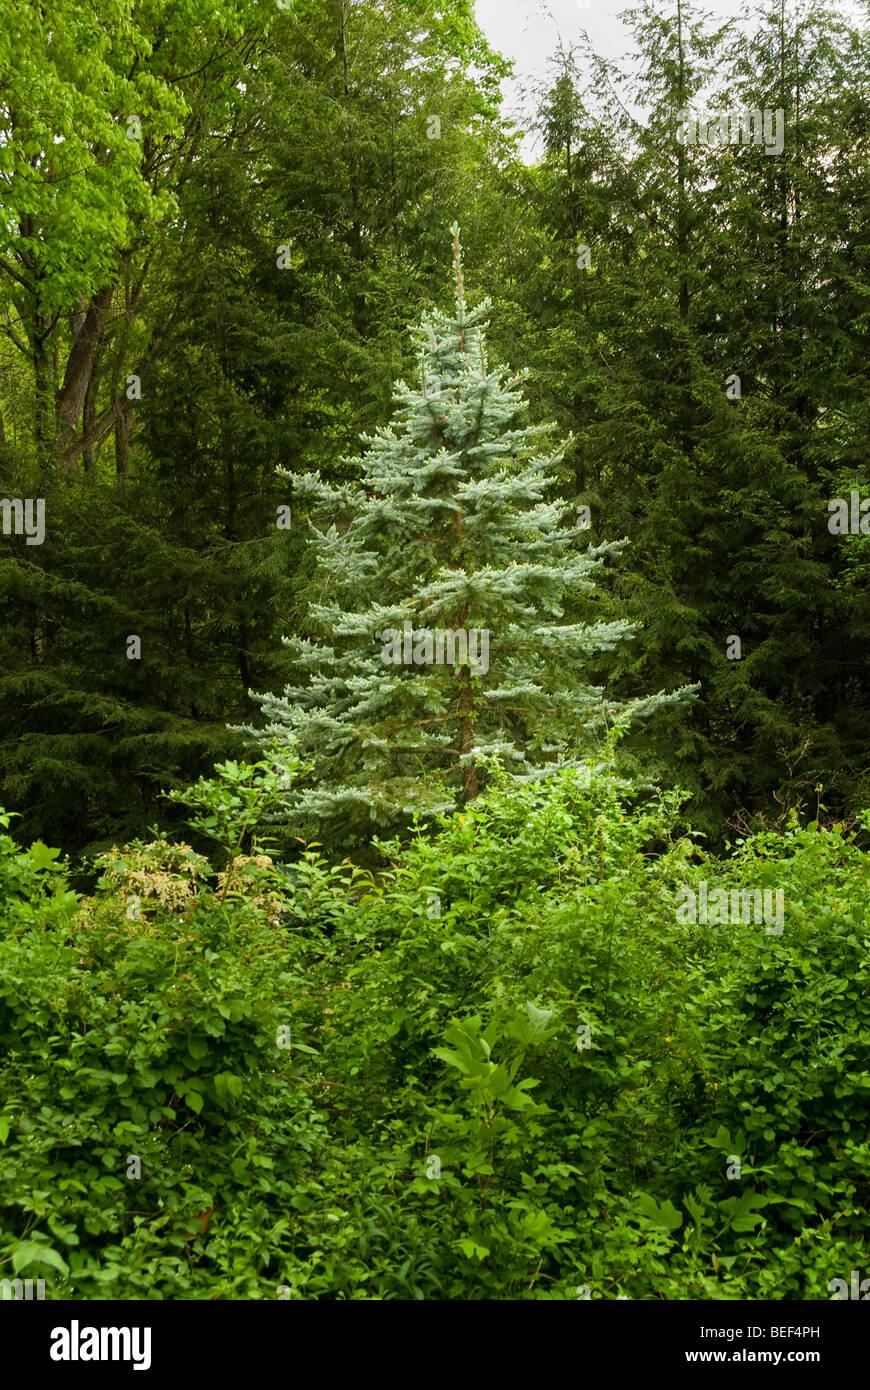 Colorado Blue Spruce tree in western North Carolina in the spring, Asheville, North Carolina, USA - Stock Image